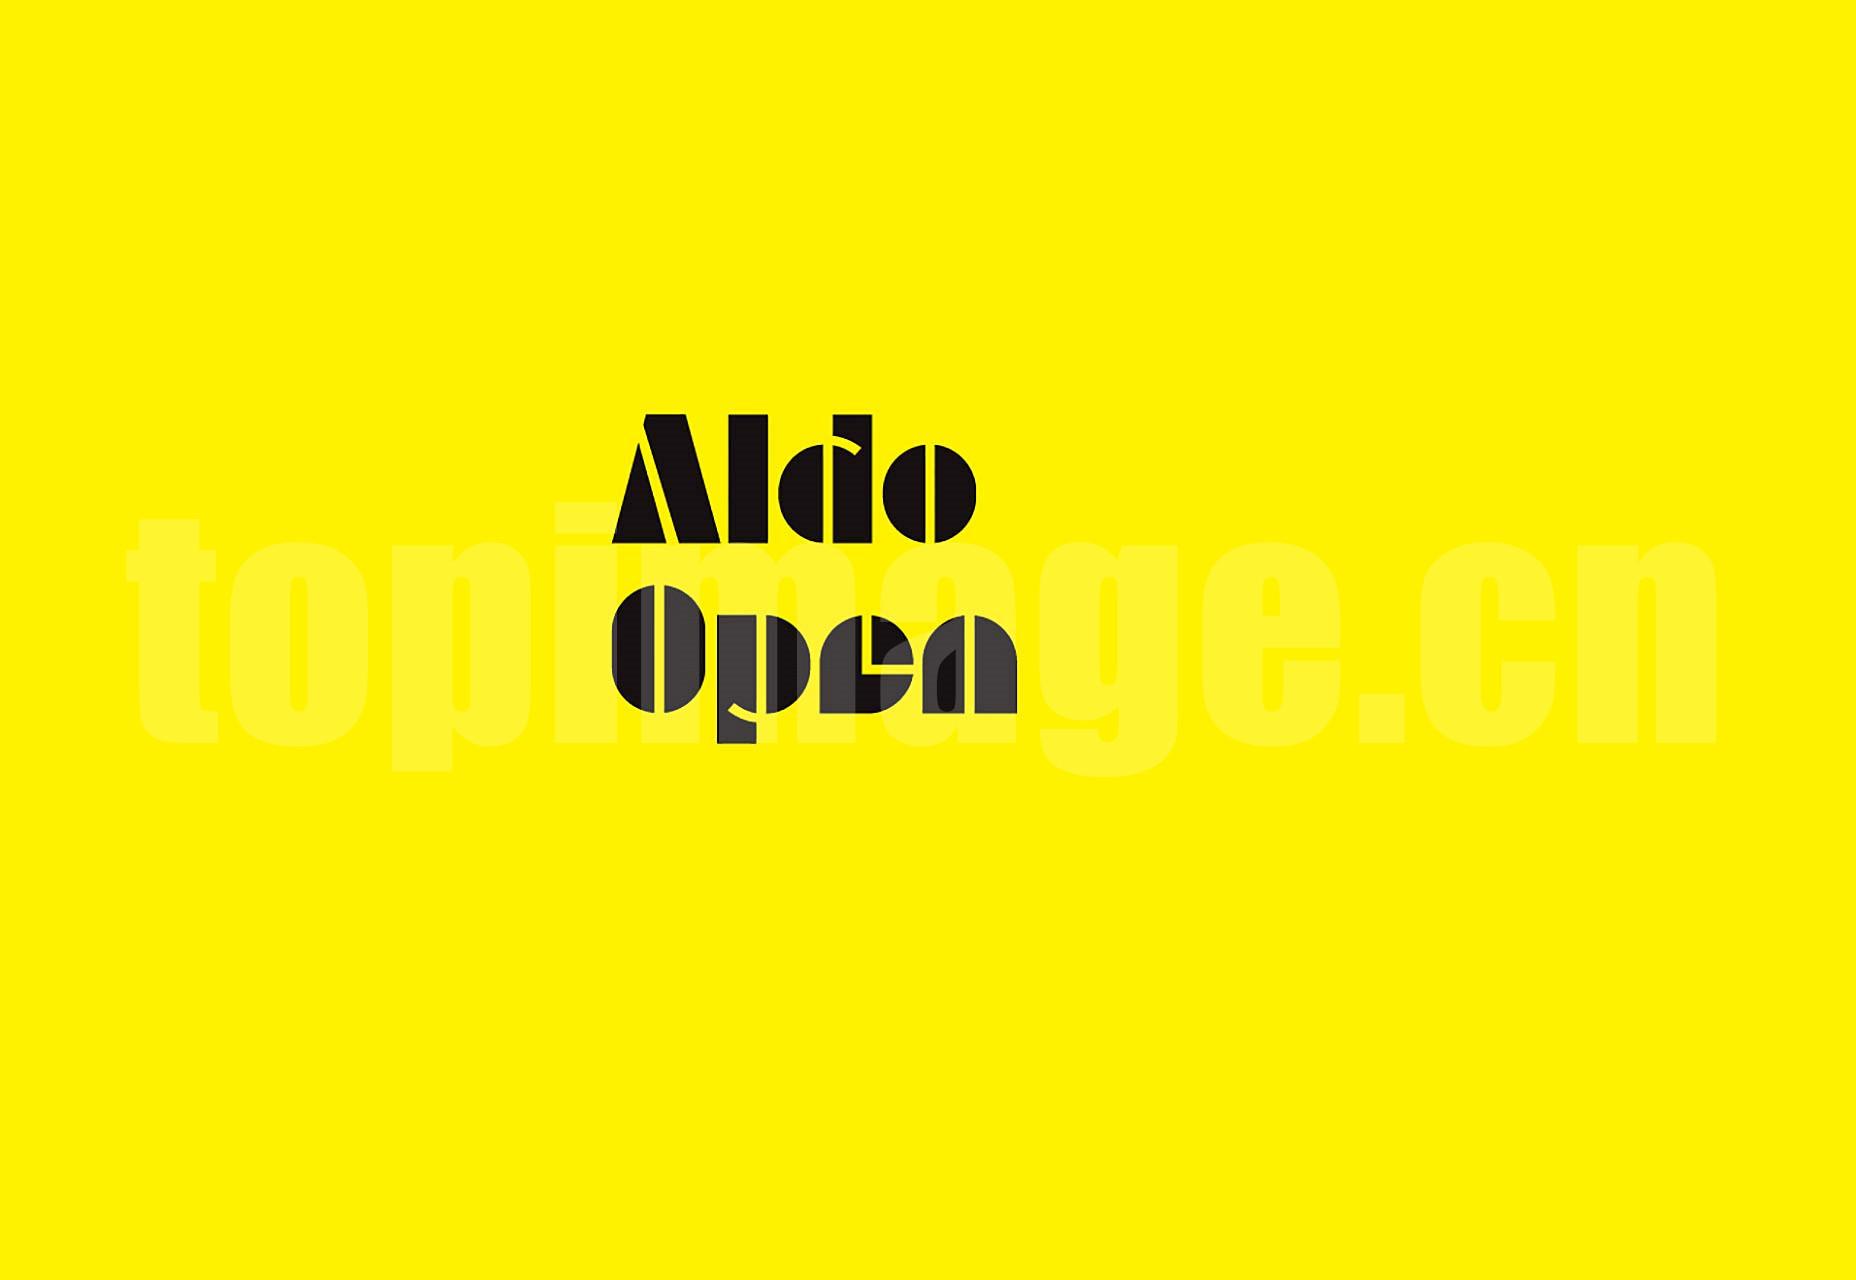 Aldo海报创意 经典logo英文字体下载